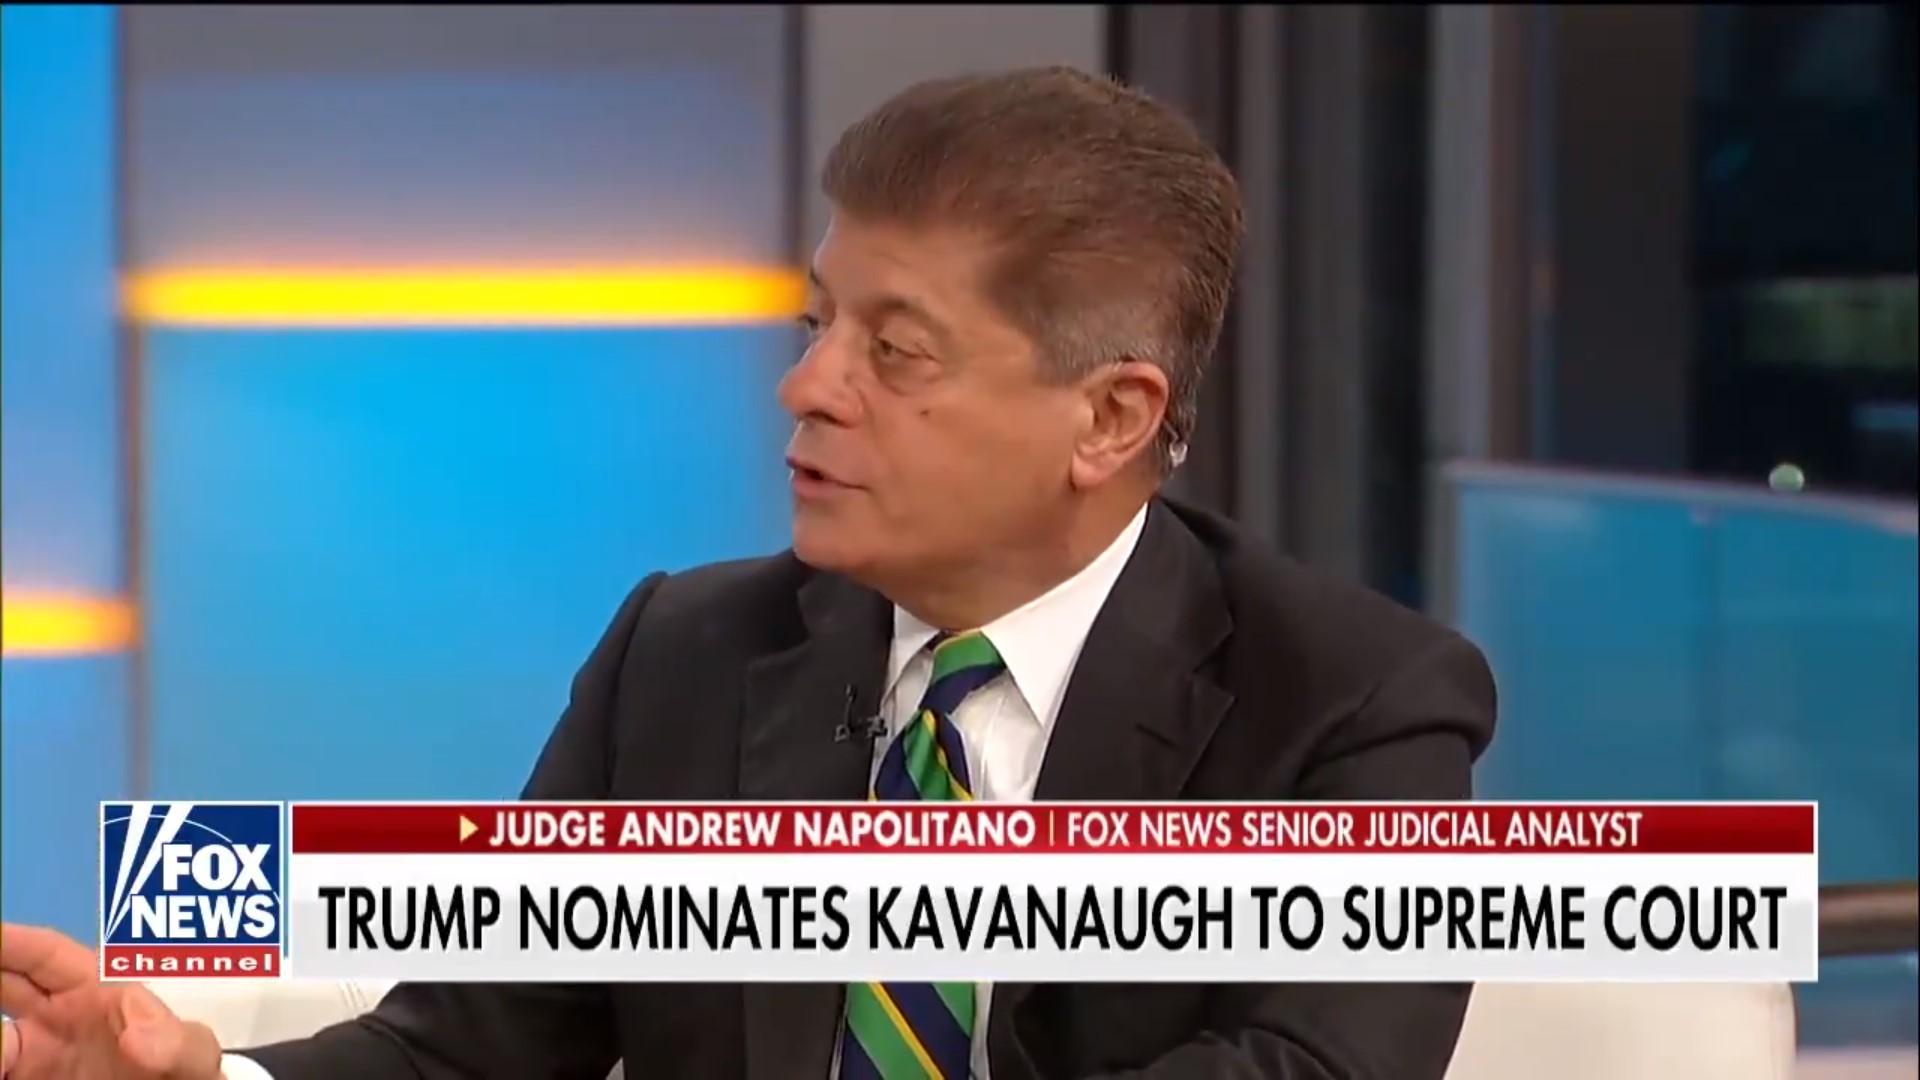 Fox's Judge Napolitano Rails Against Trump's SCOTUS Pick: 'The Swamp' Wanted Kavanaugh